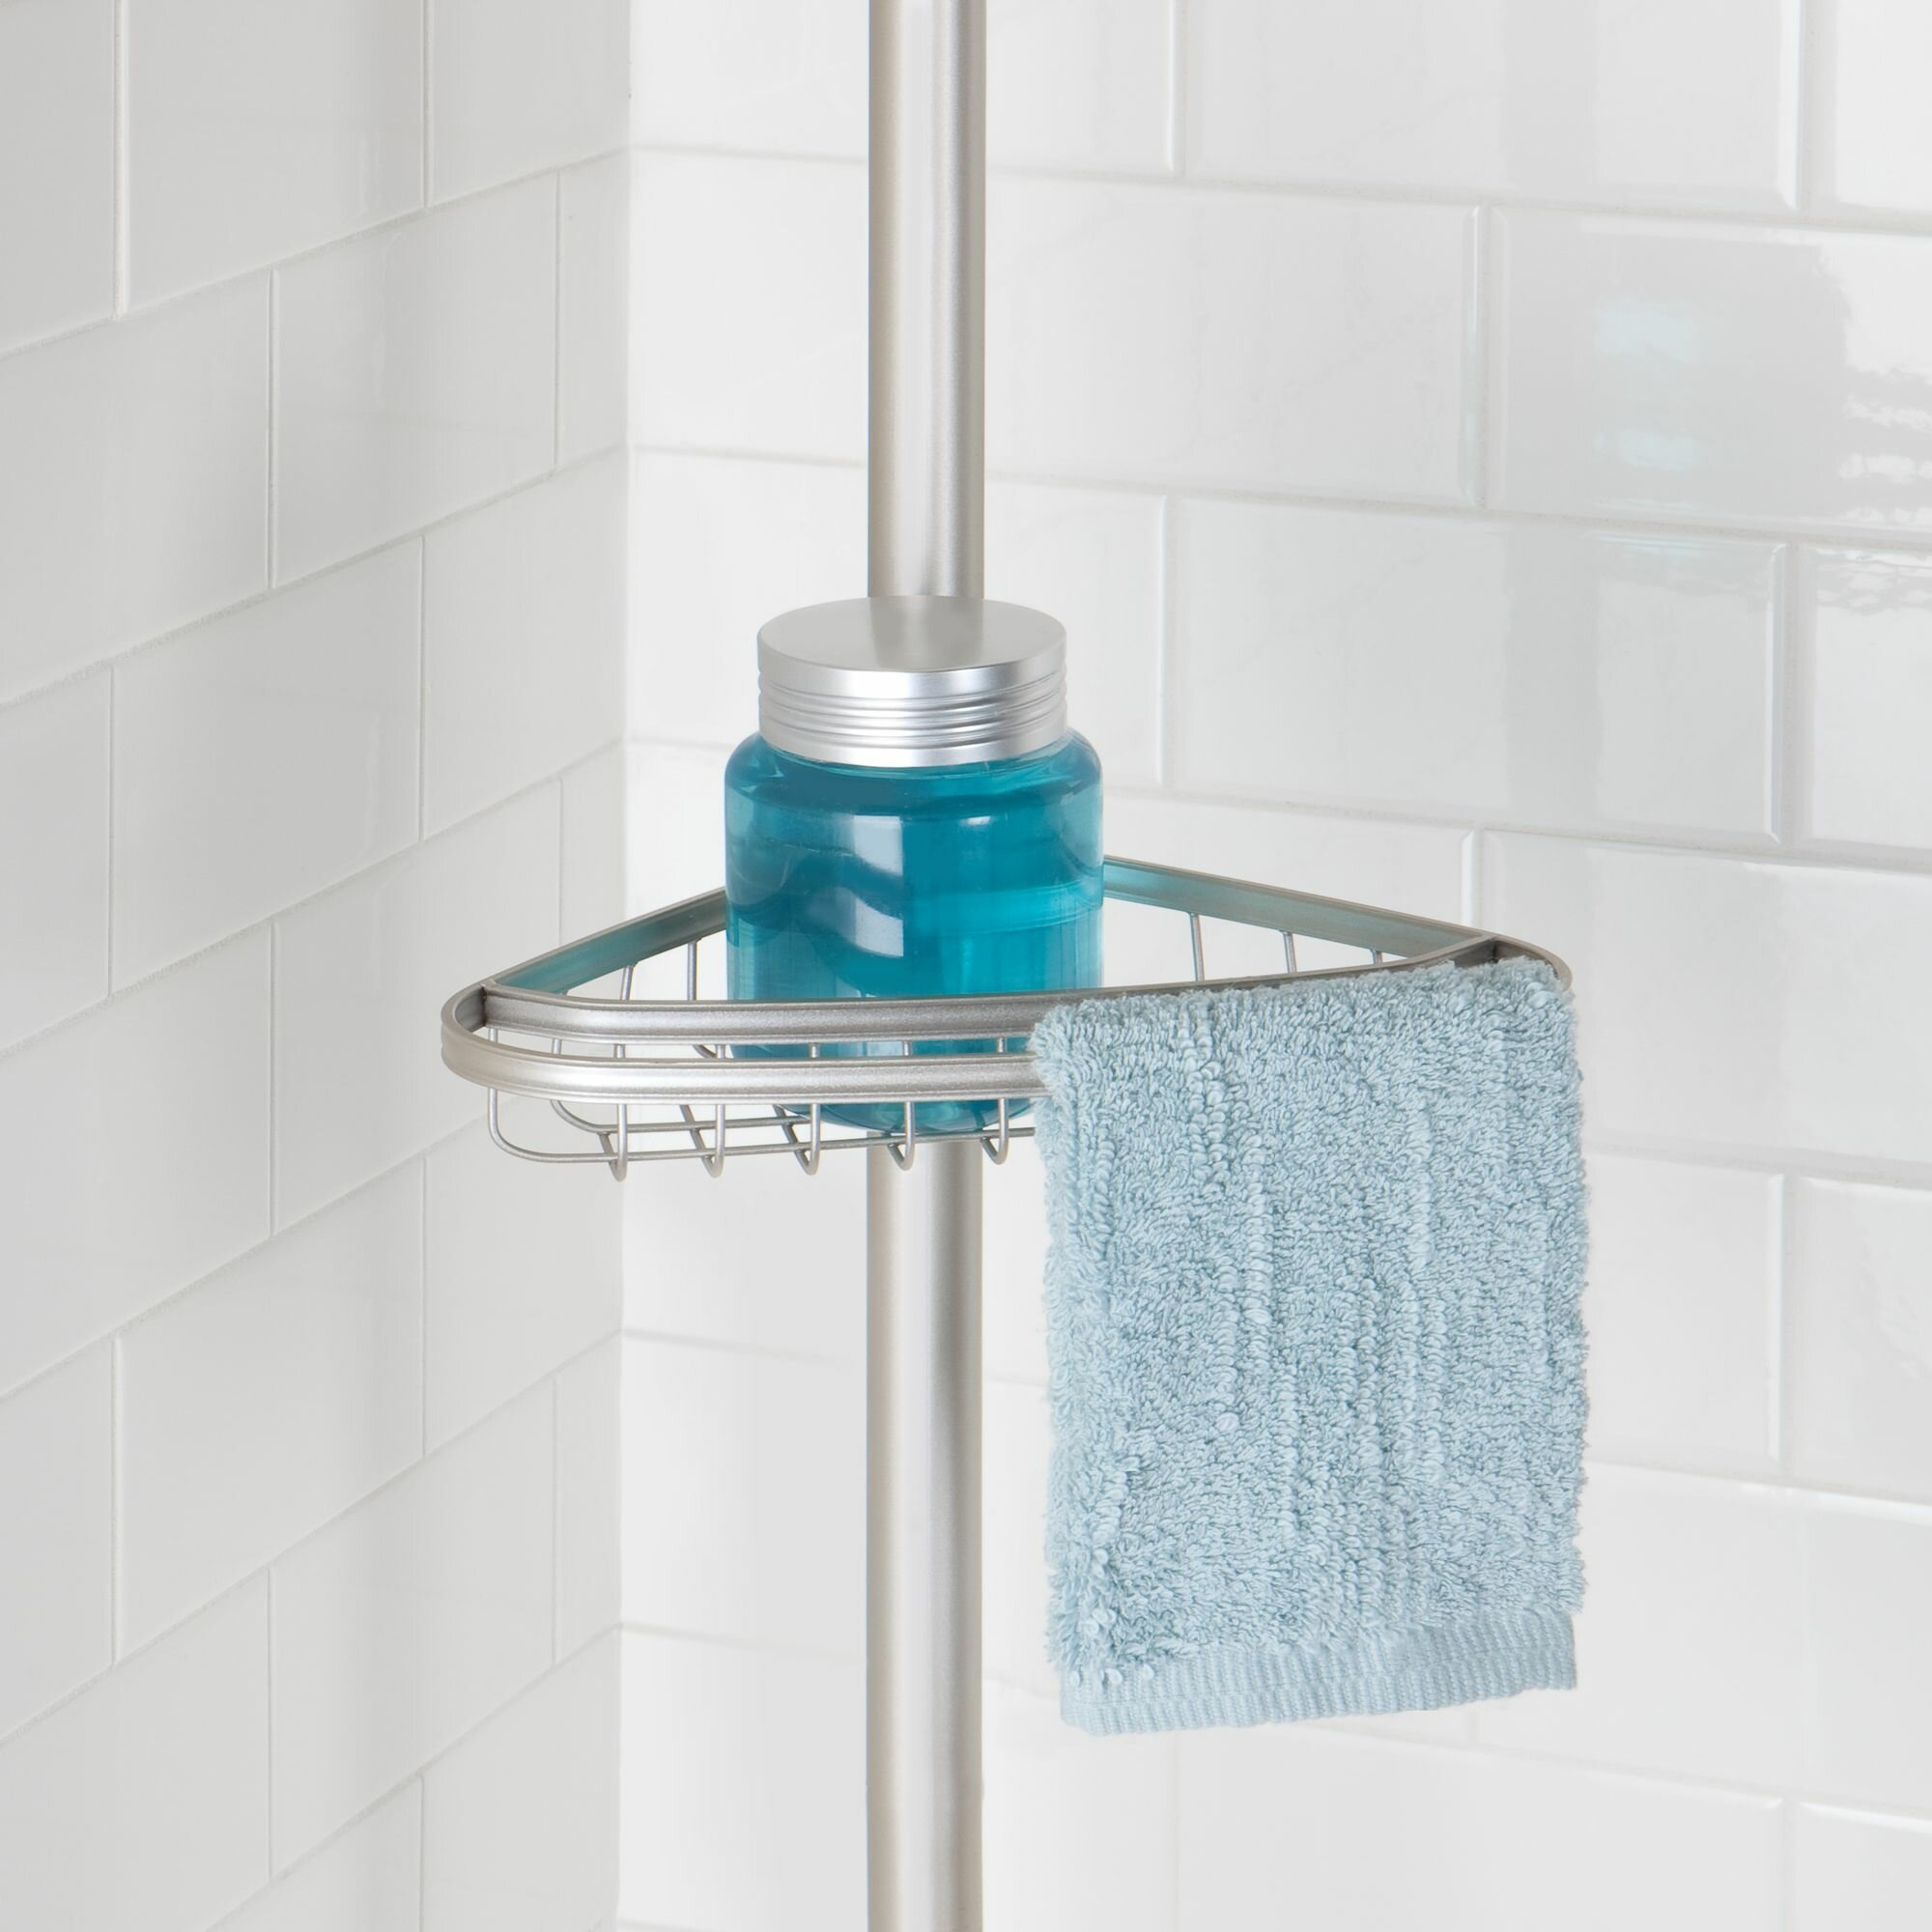 InterDesign York Shower Caddy | Wayfair